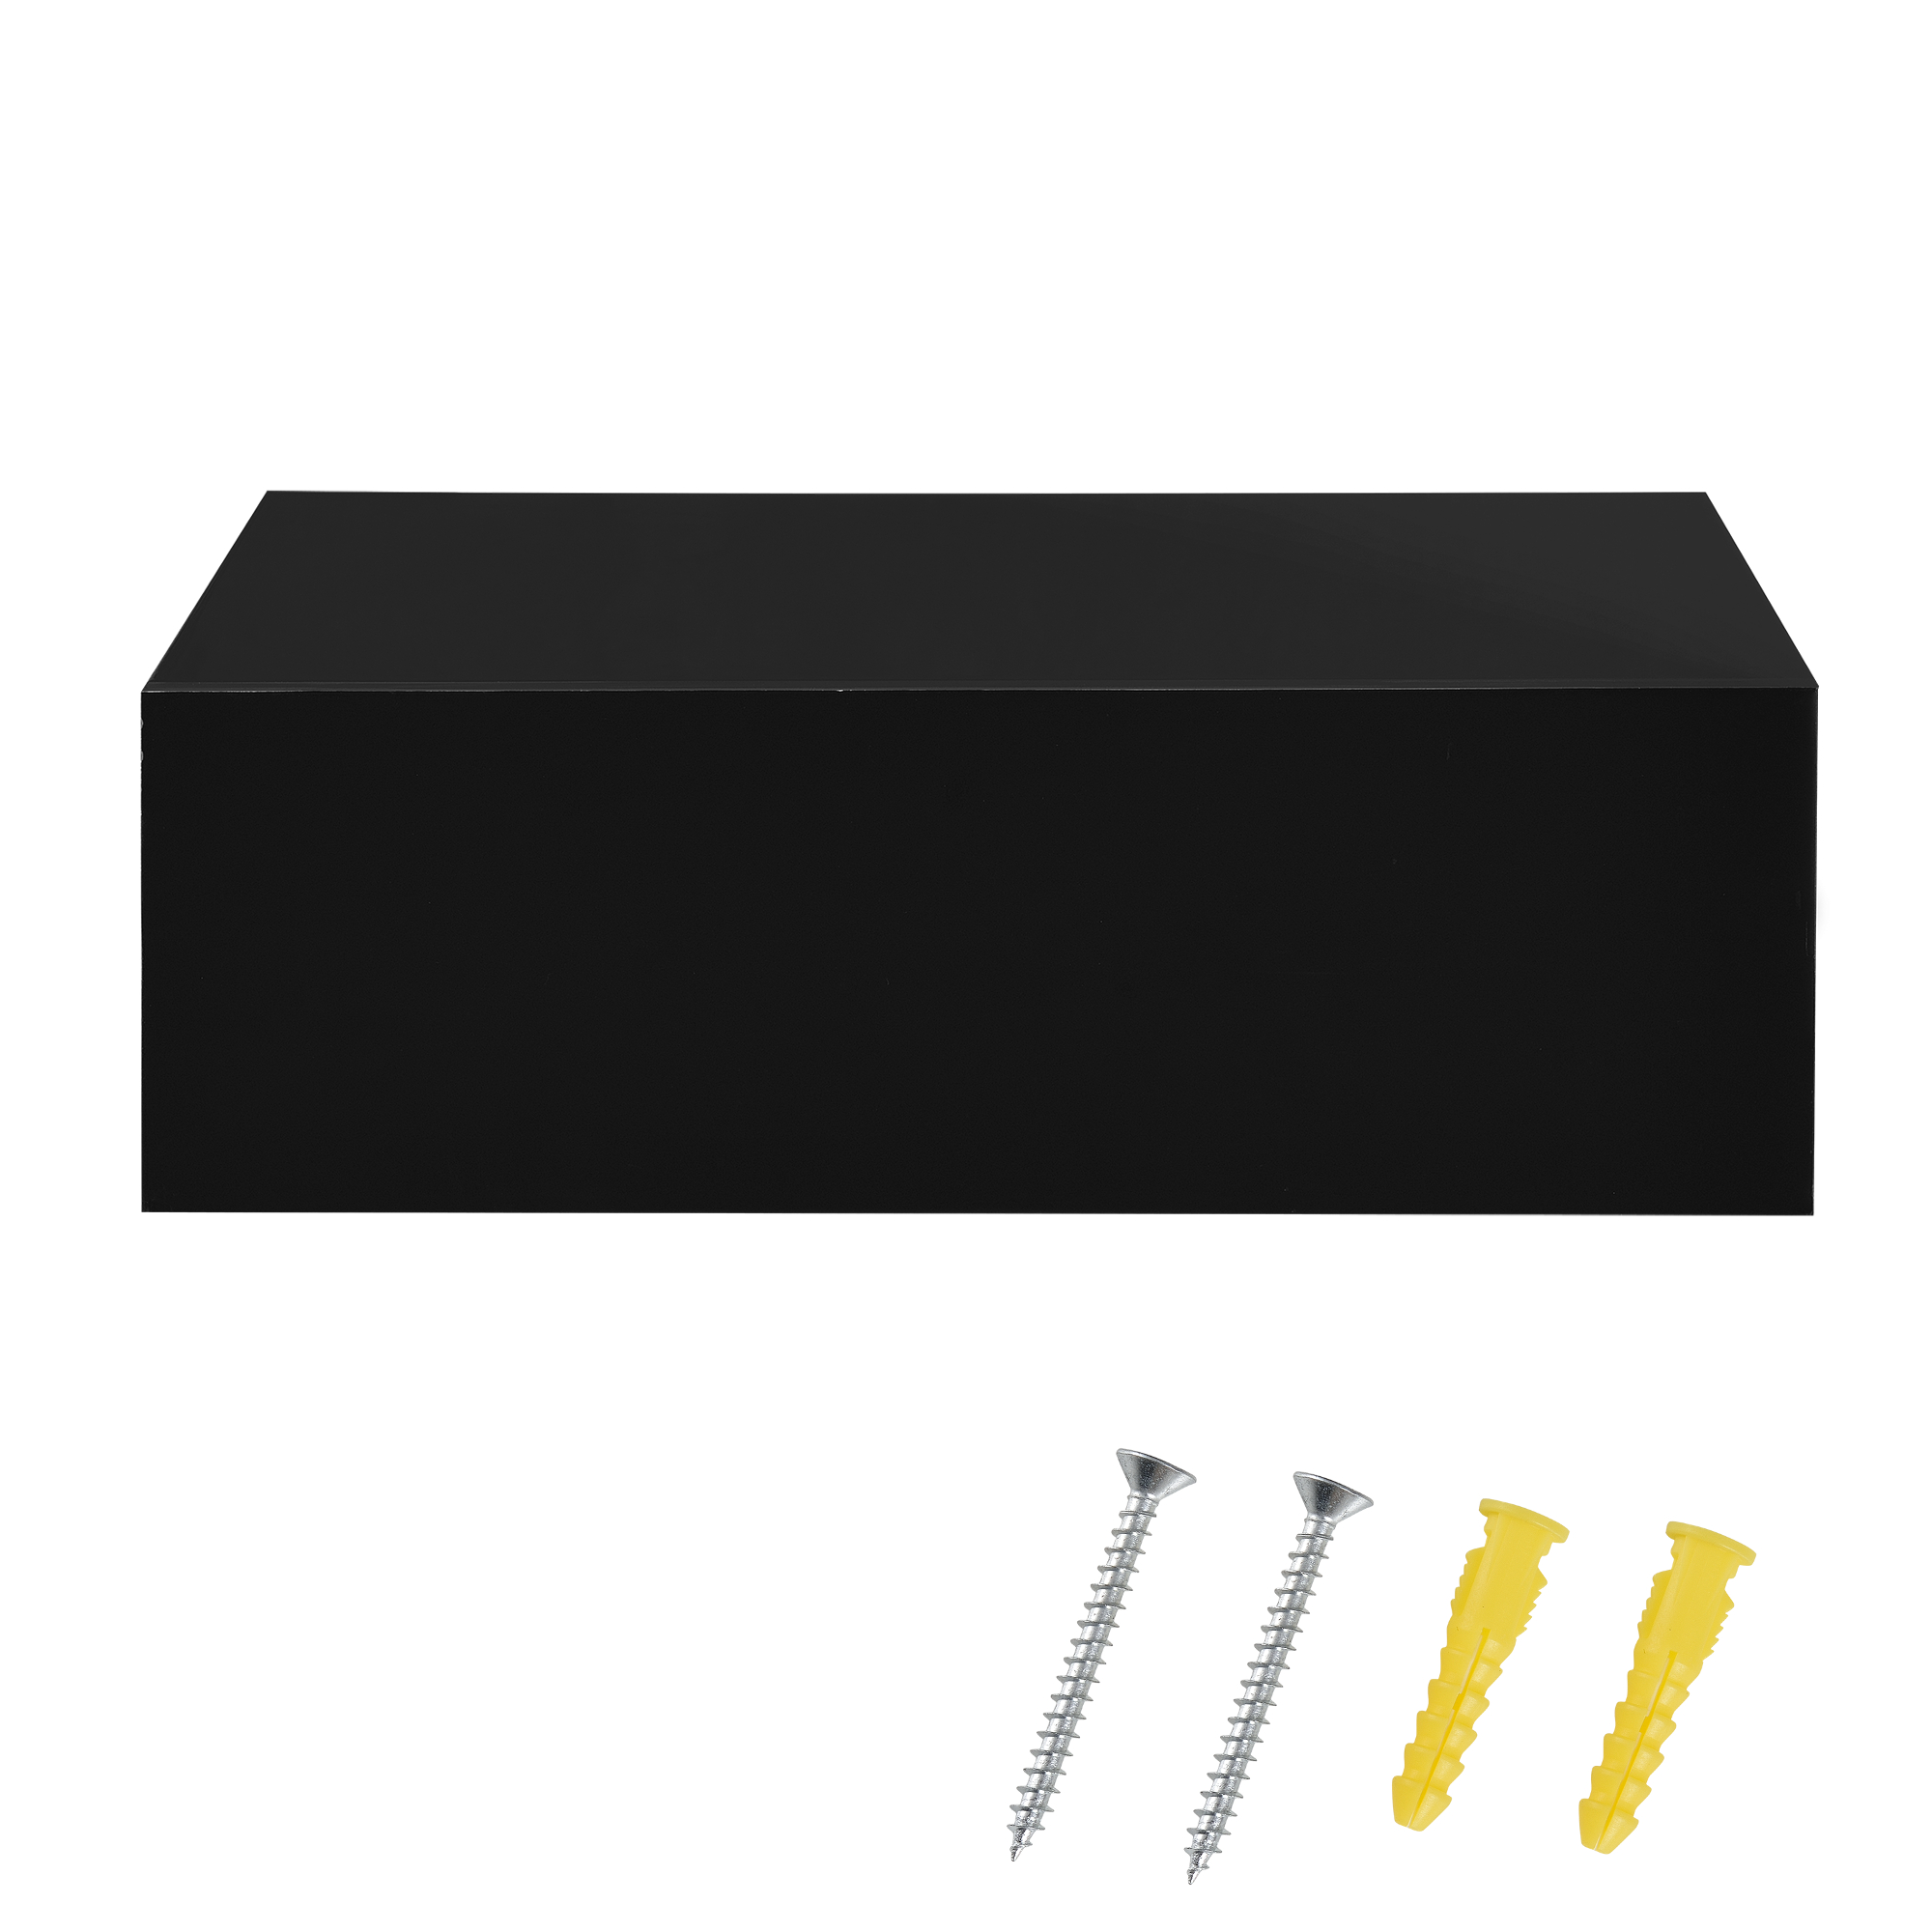 kommode nachttisch wandregal tv lowboard wand schublade sideboard ebay. Black Bedroom Furniture Sets. Home Design Ideas